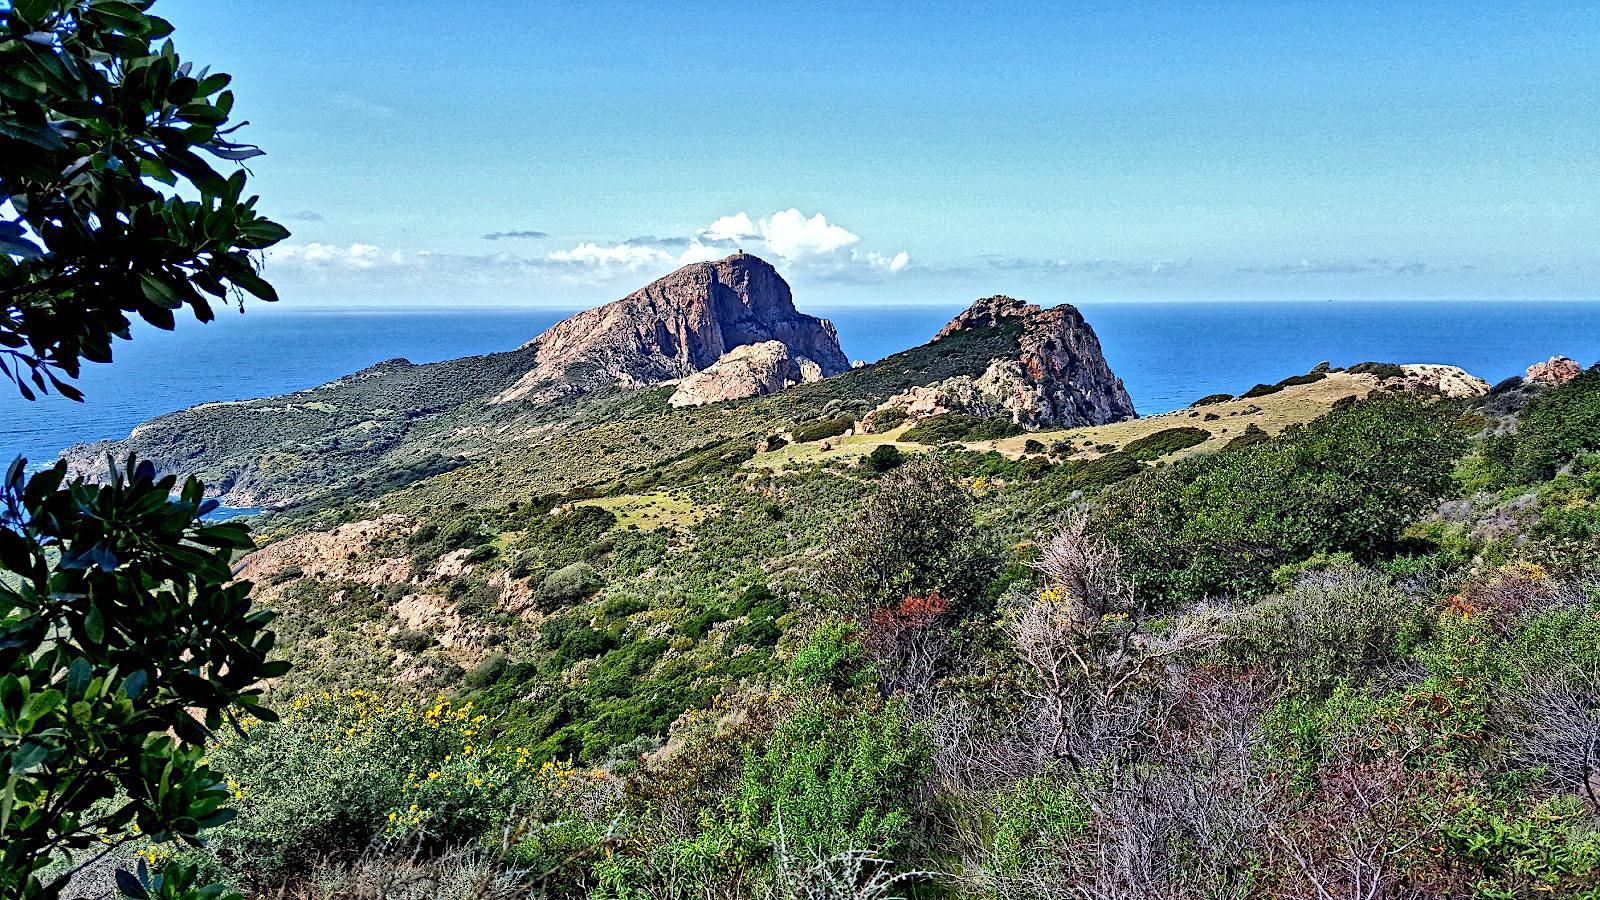 La photo du jour : Le site naturel de Capu Rossu